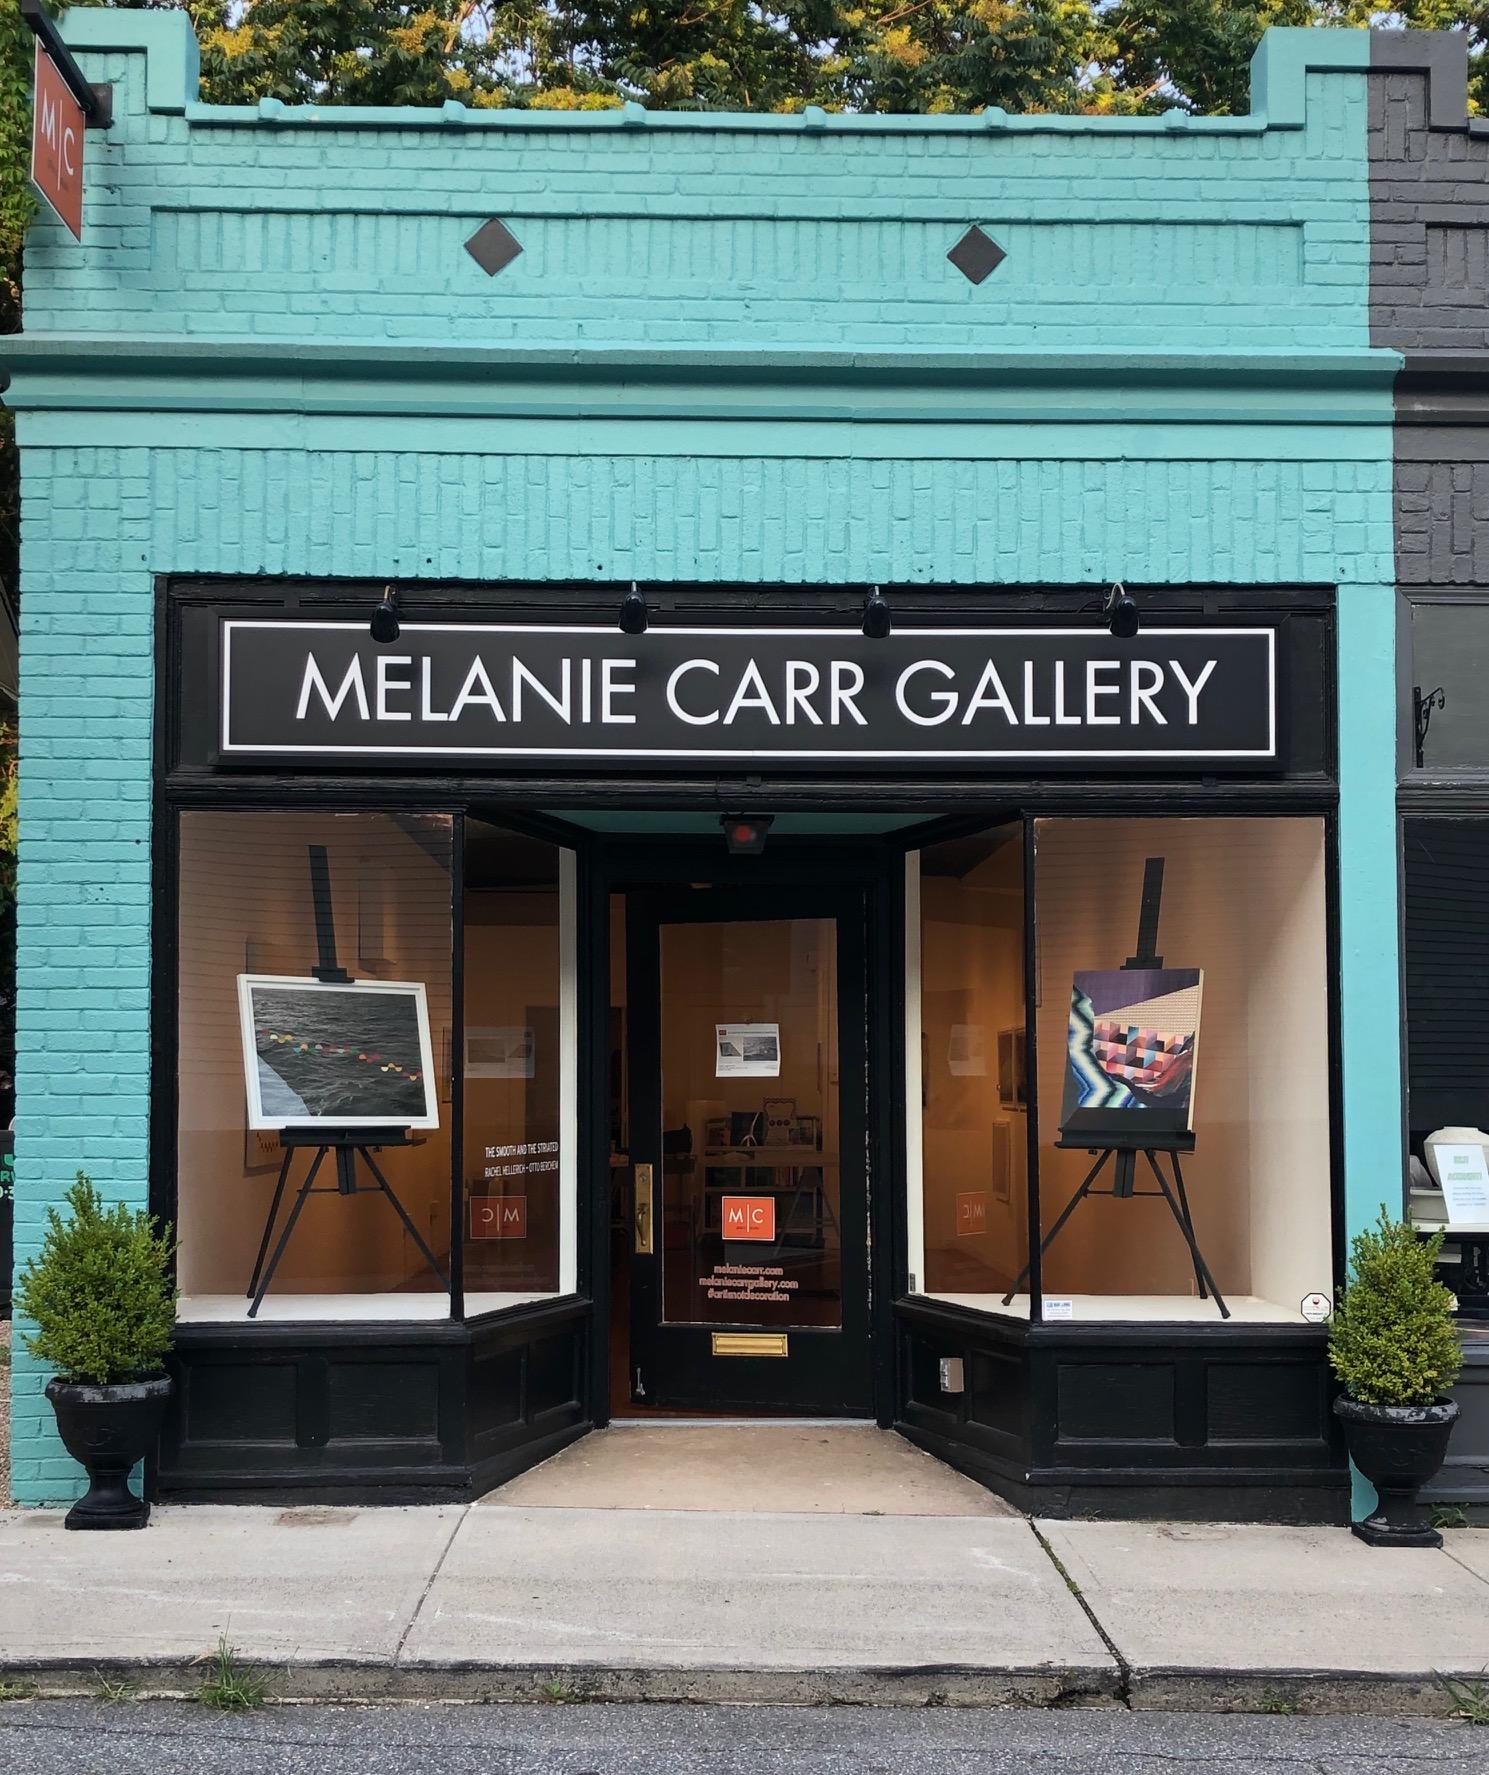 Melanie Carr Gallery, Essex, CT. July 2019. Photo Courtesy of Rachel Hellerich.